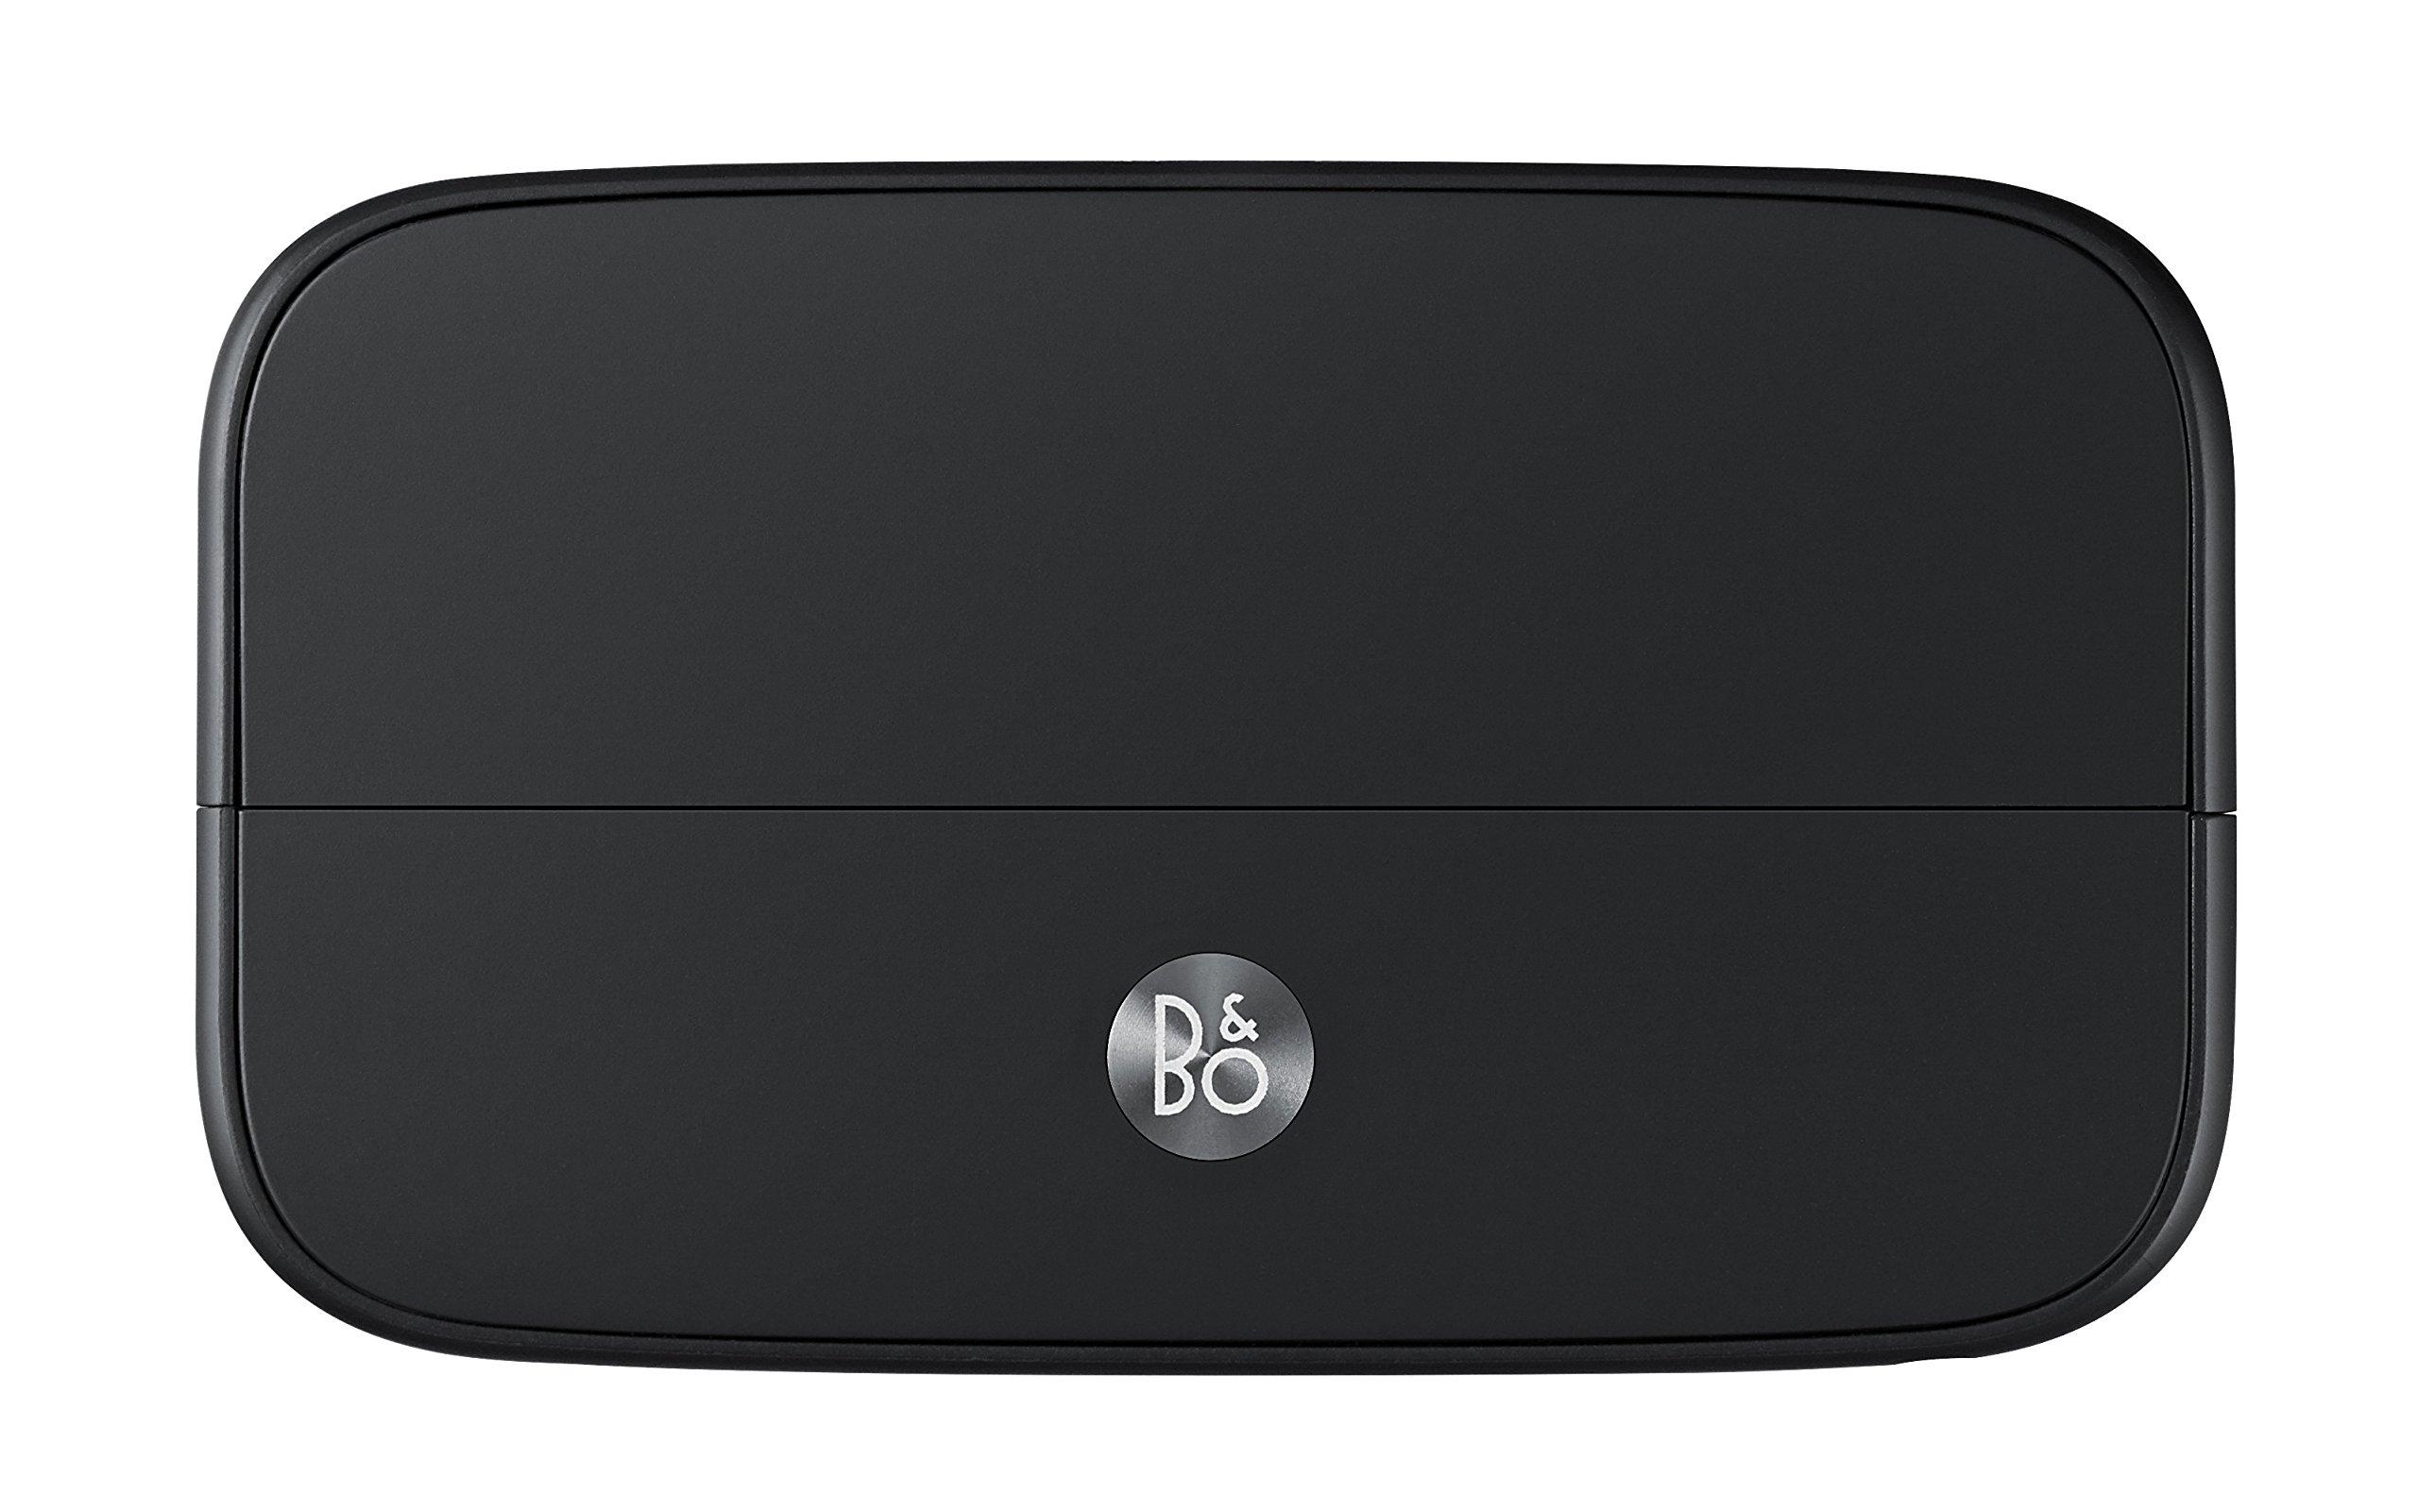 B&O Play with LG Hi-Fi Plus AFD-1200 B&O Play Sound with 32bit Hi-Fi DAC by B&OPlay